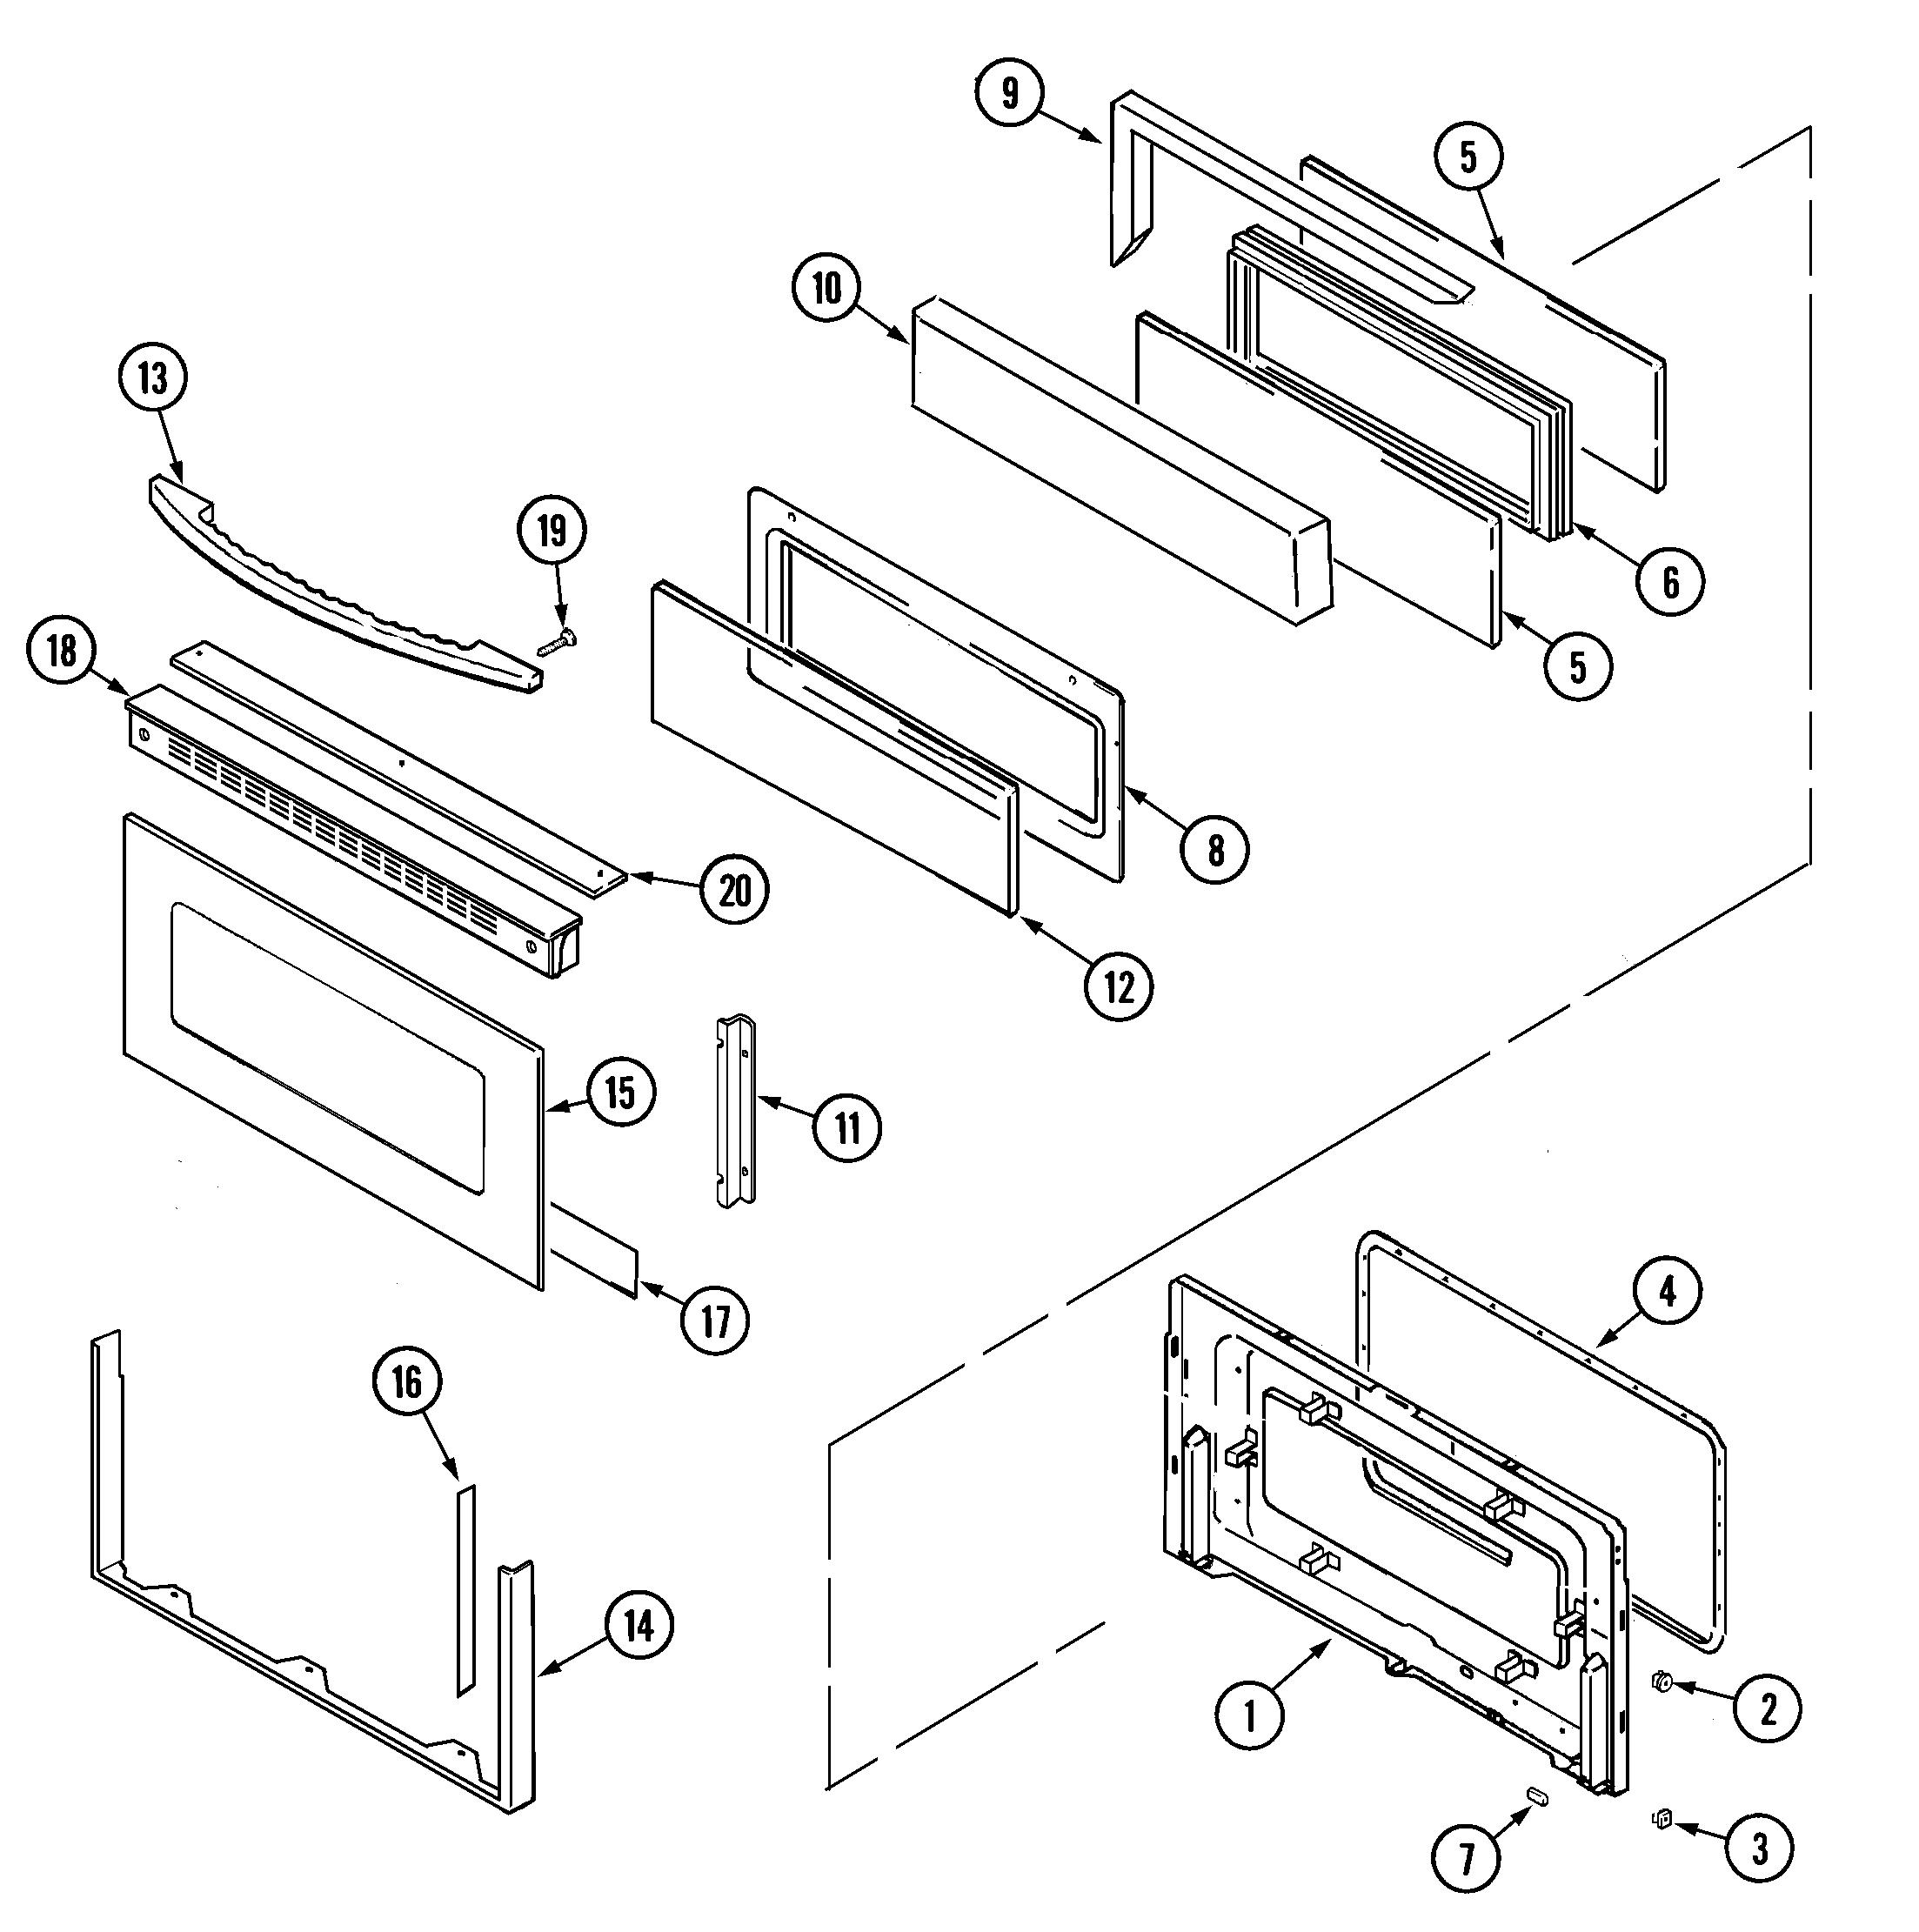 Maytag Atlantis Washer Wiring Diagrams Washing Parts Diagram On Vos Machine Electric Dryer